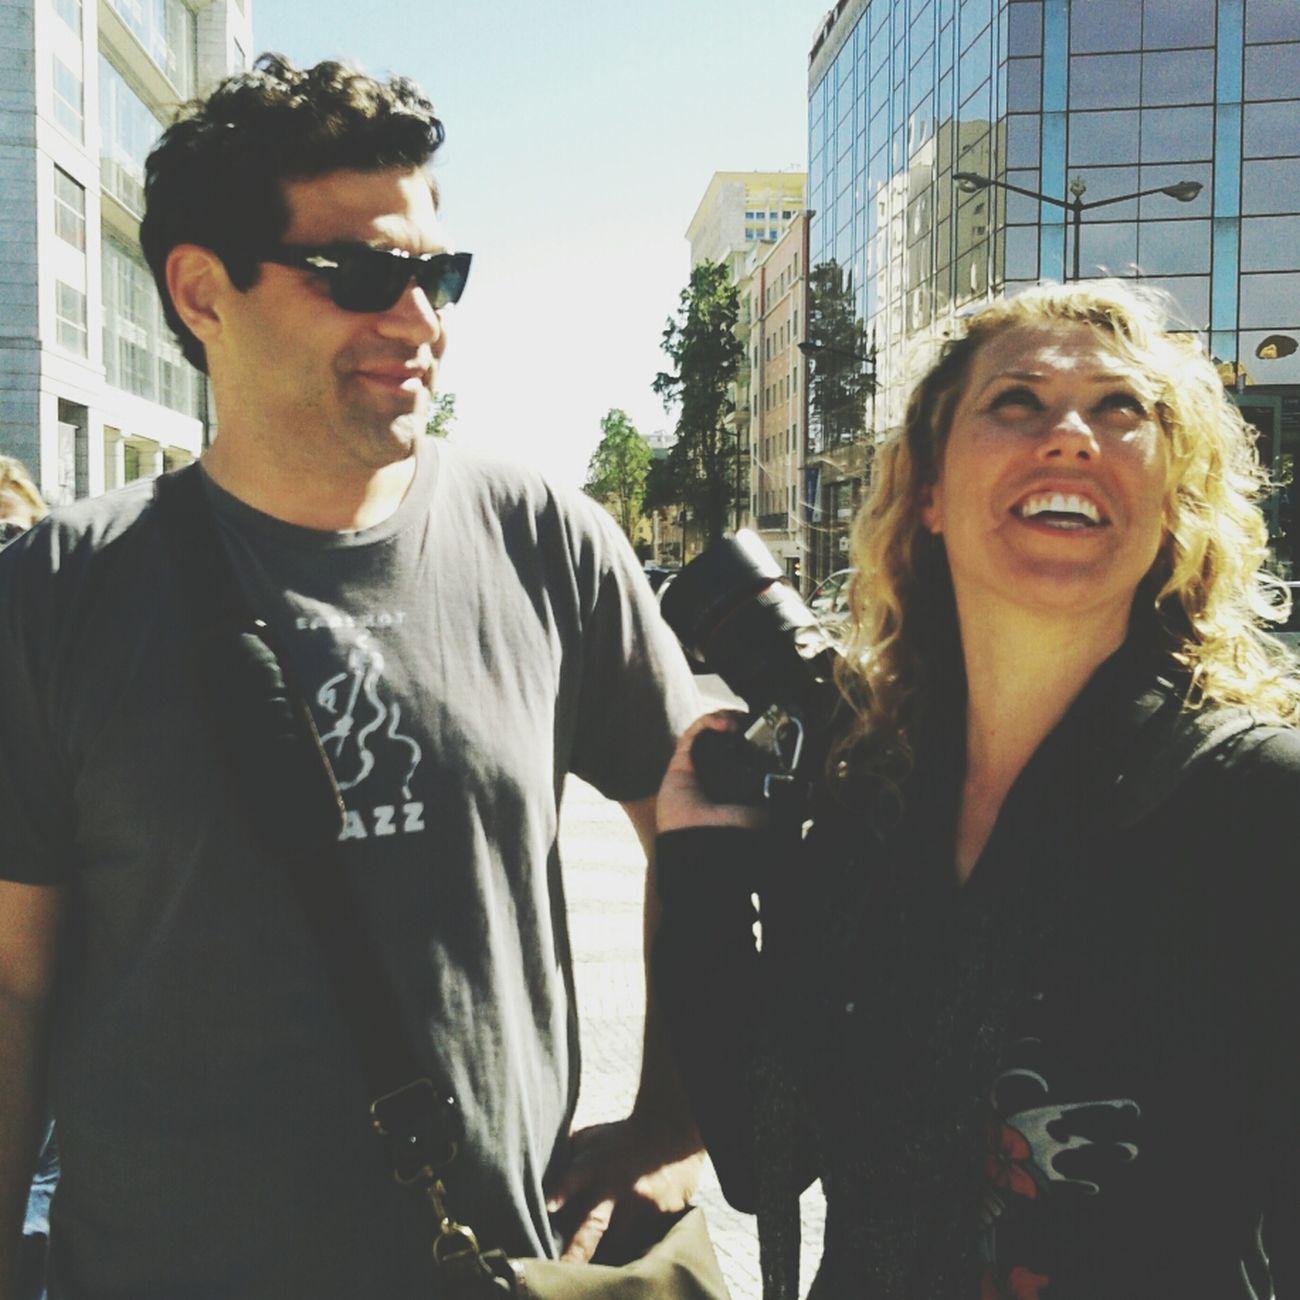 Neill Barham and Susan Roderick at EyeEm Lisbon Masterclass 2013 Streetphotography Portugal Steph Filter EyeEm Lisbon Masterclass 2013